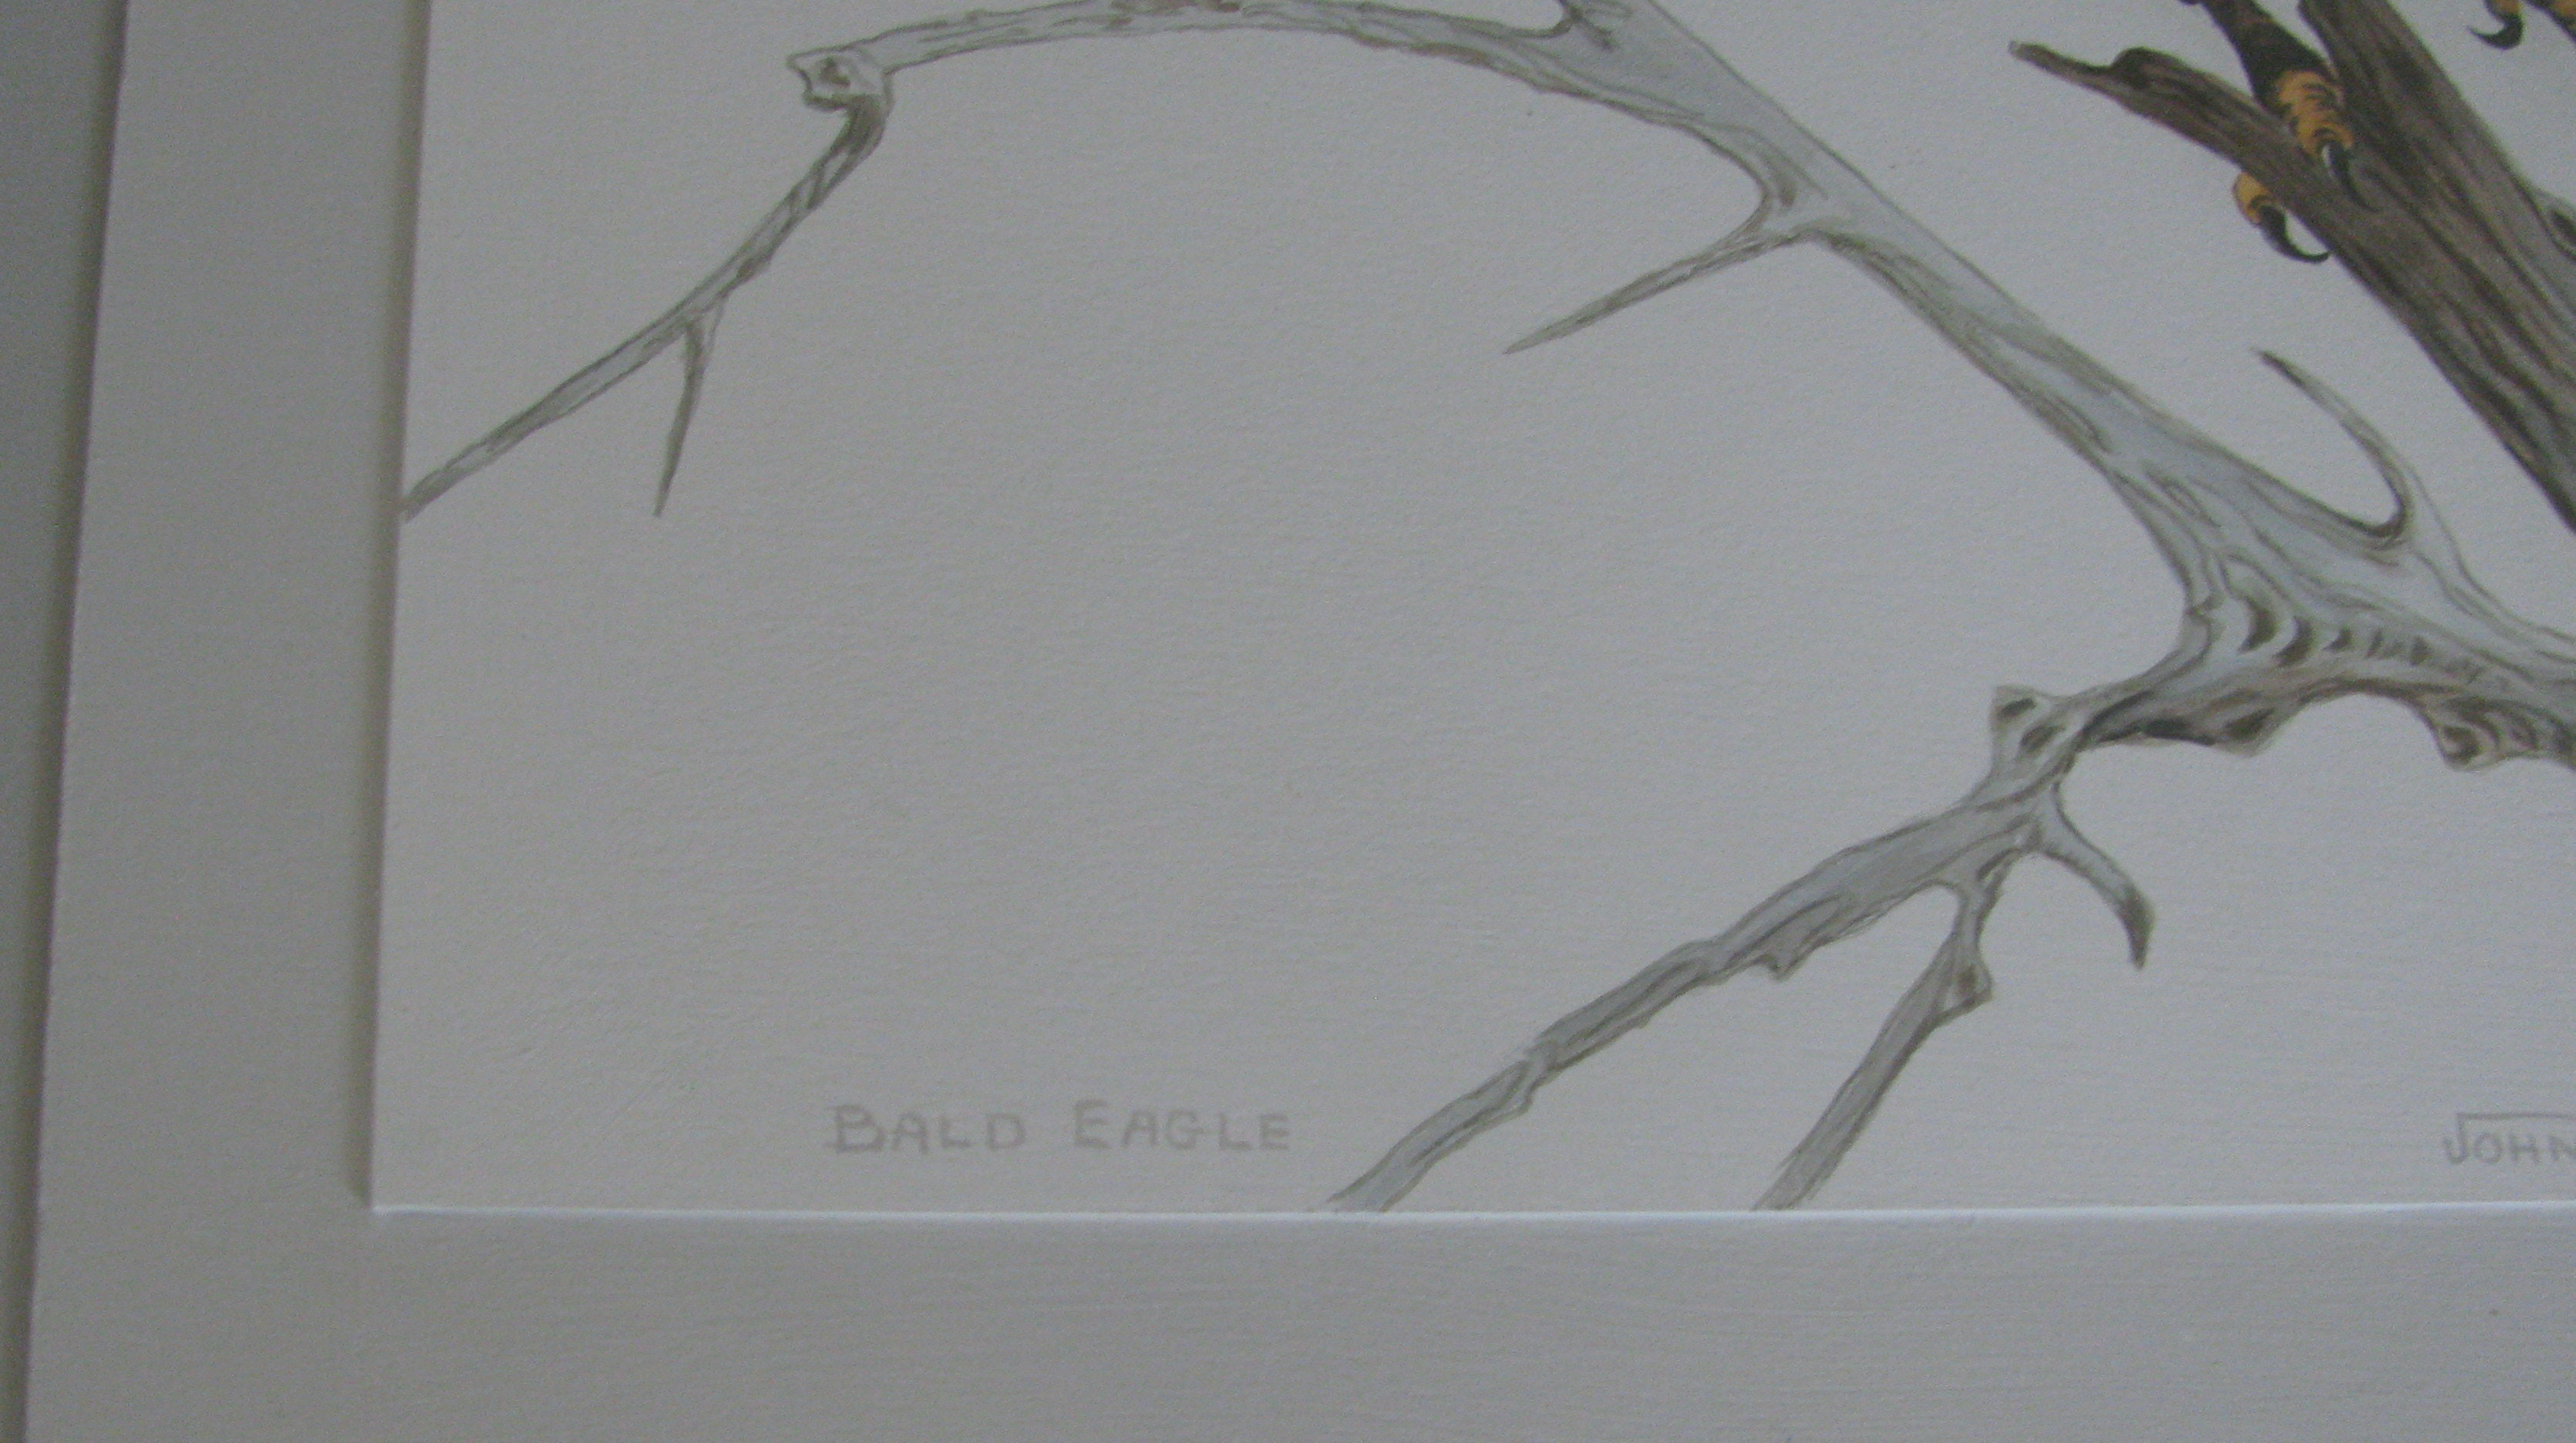 Framed Bald Eagle Print By John E Bradley Ebth